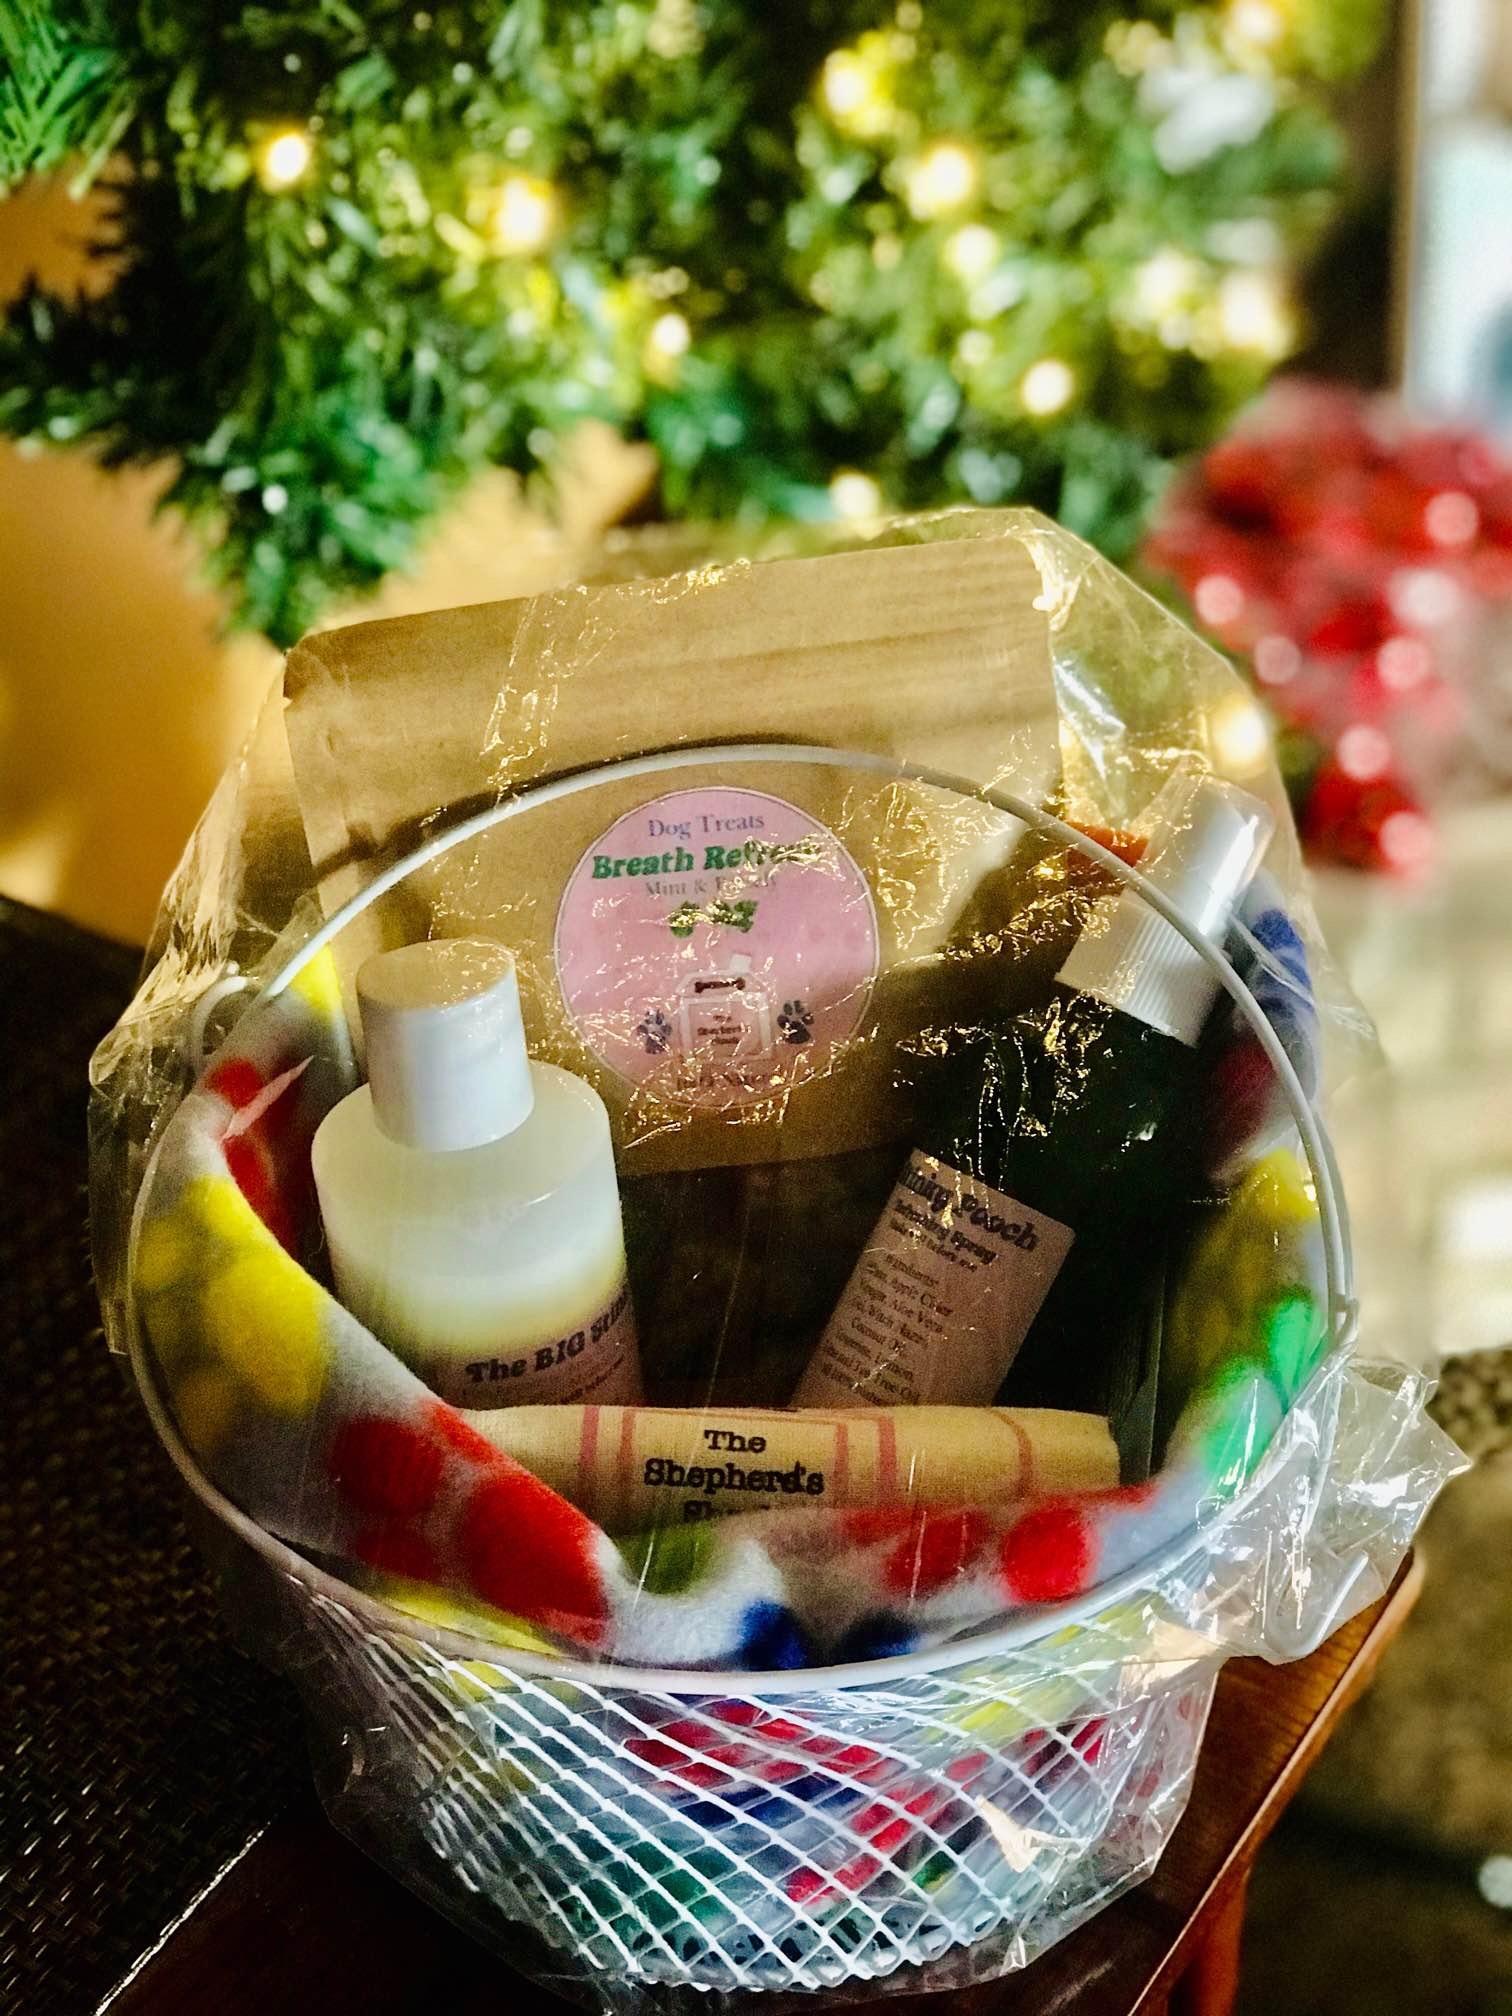 Lizzy Lewellyn product basket